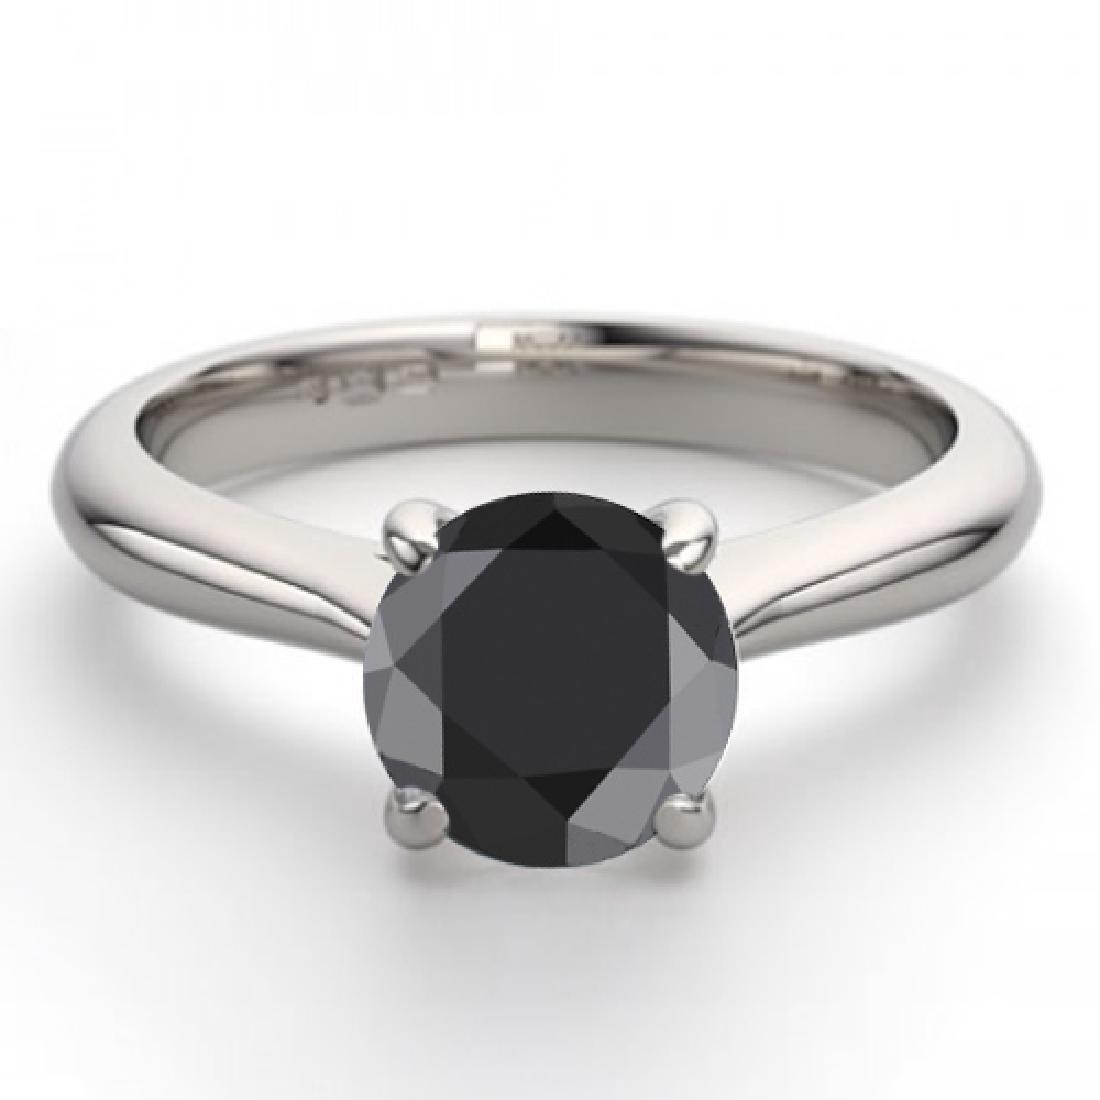 14K White Gold Jewelry 1.24 ctw Black Diamond Solitaire